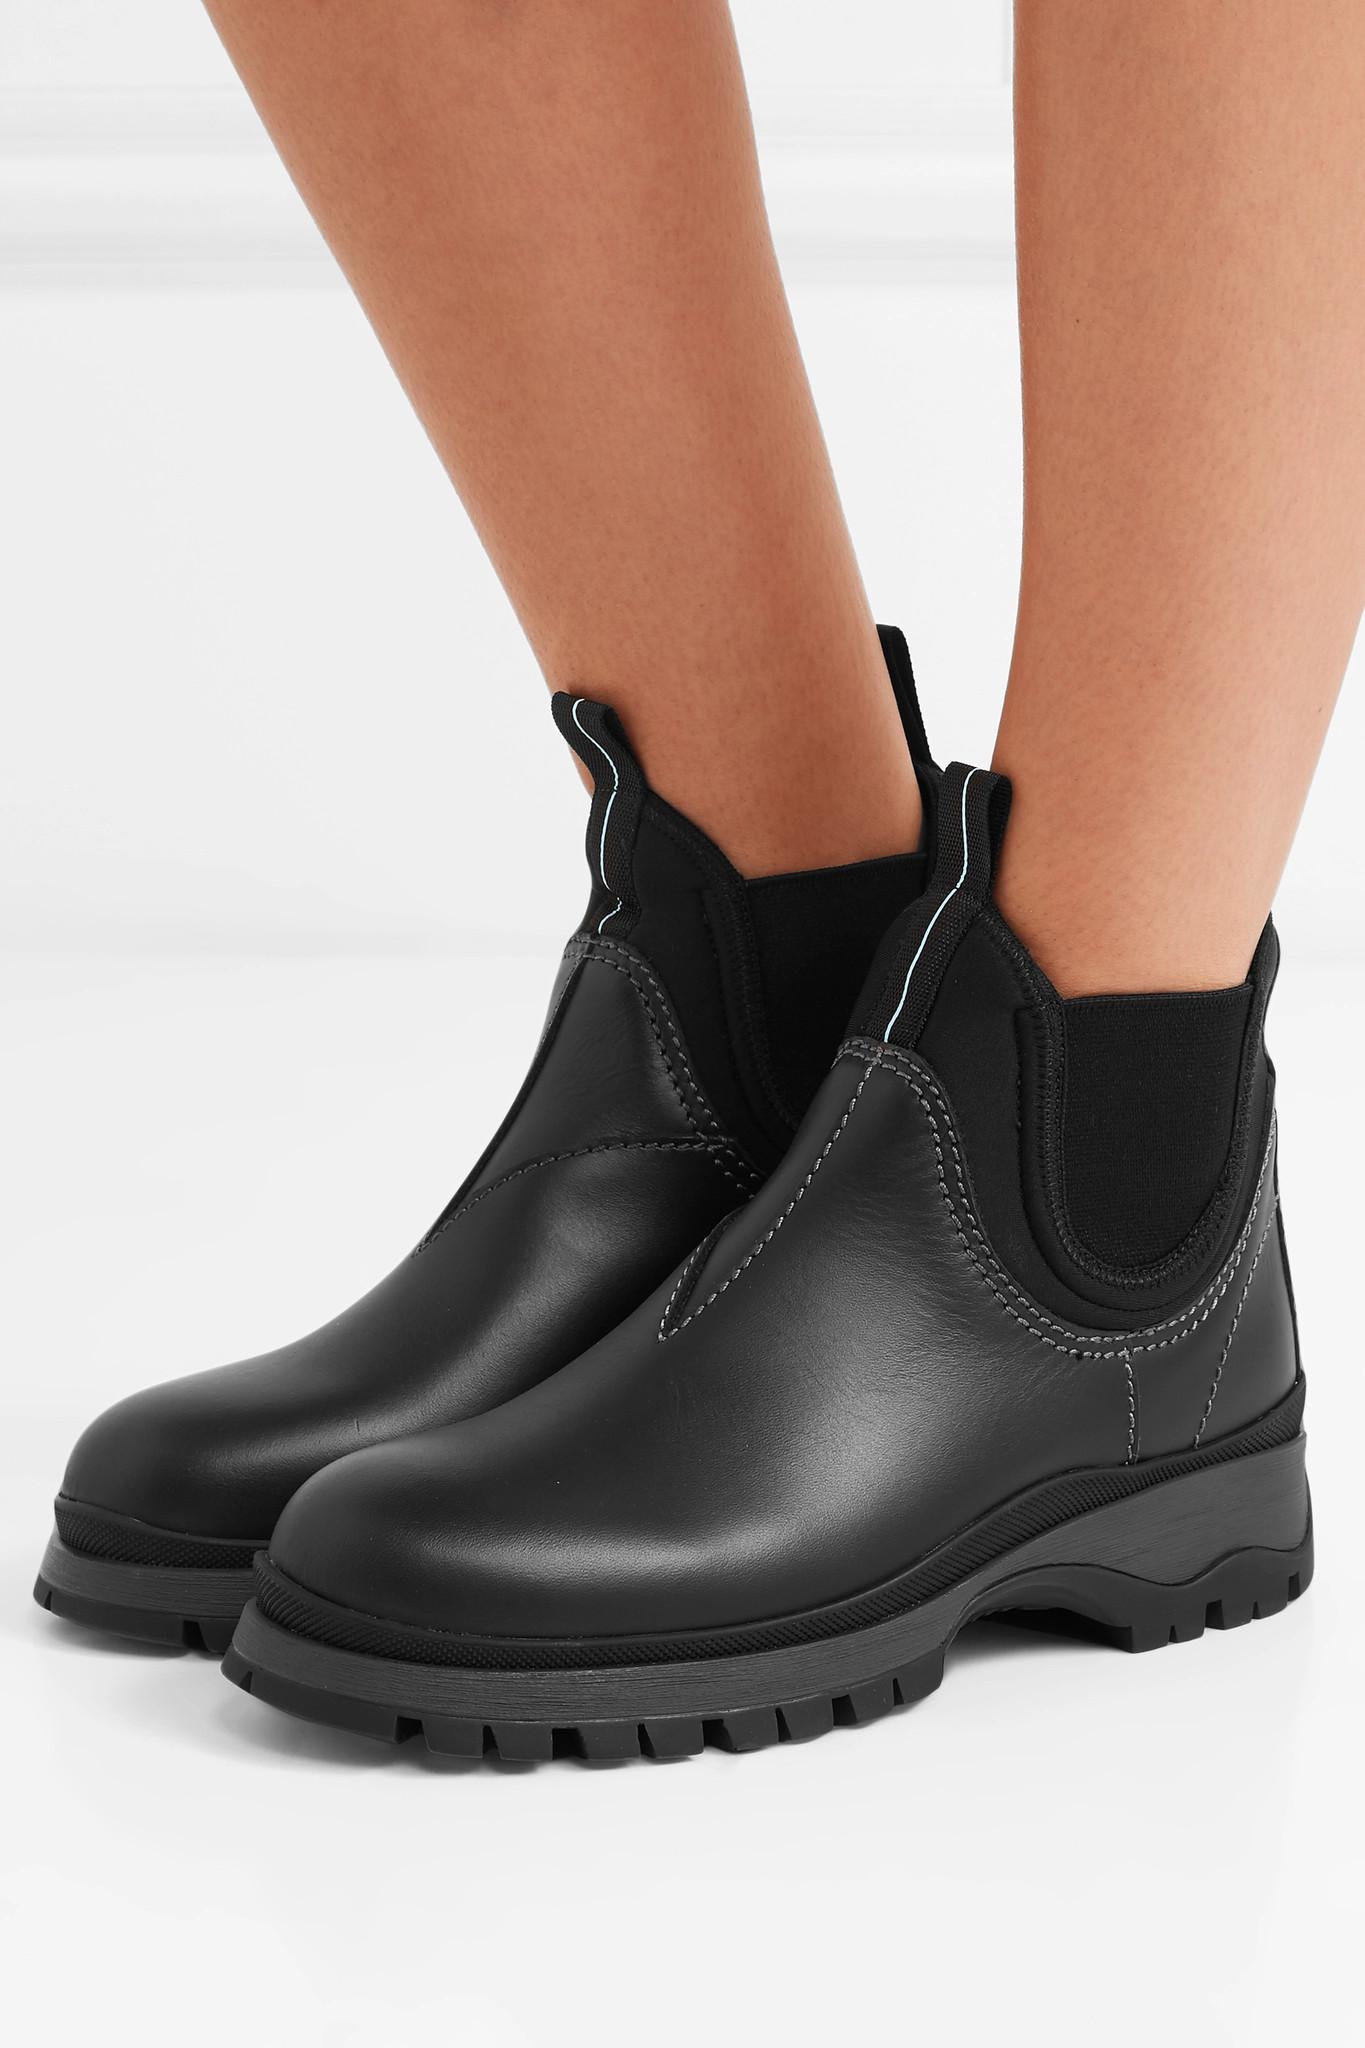 7e457ff330d1 Prada - Black Lug-sole Leather & Neoprene Chelsea Boots - Lyst. View  fullscreen